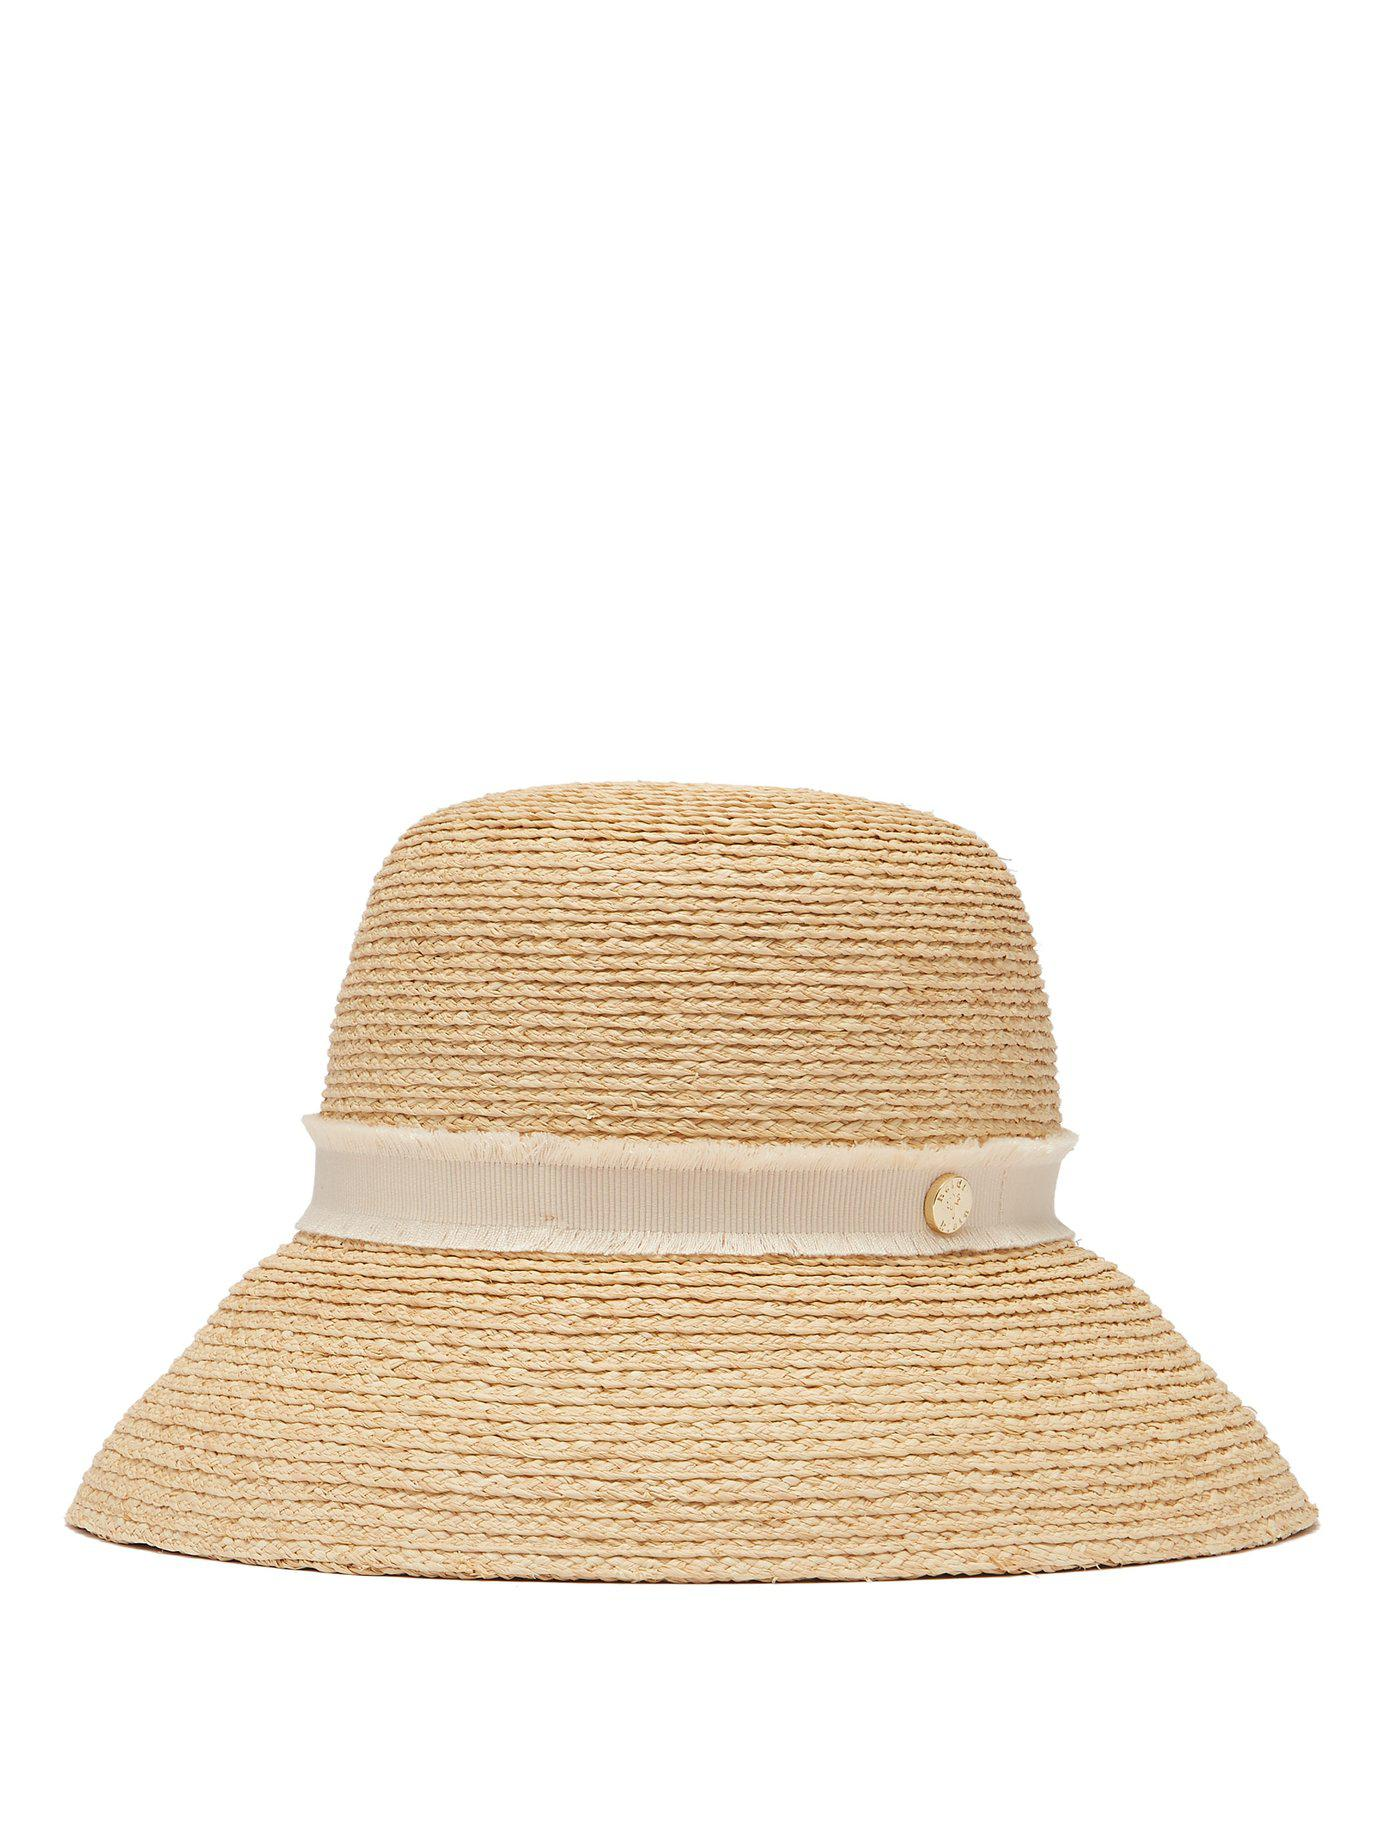 Lyst - Heidi Klein Cape Elizabeth Straw Hat in Natural e41a1c97bc4d